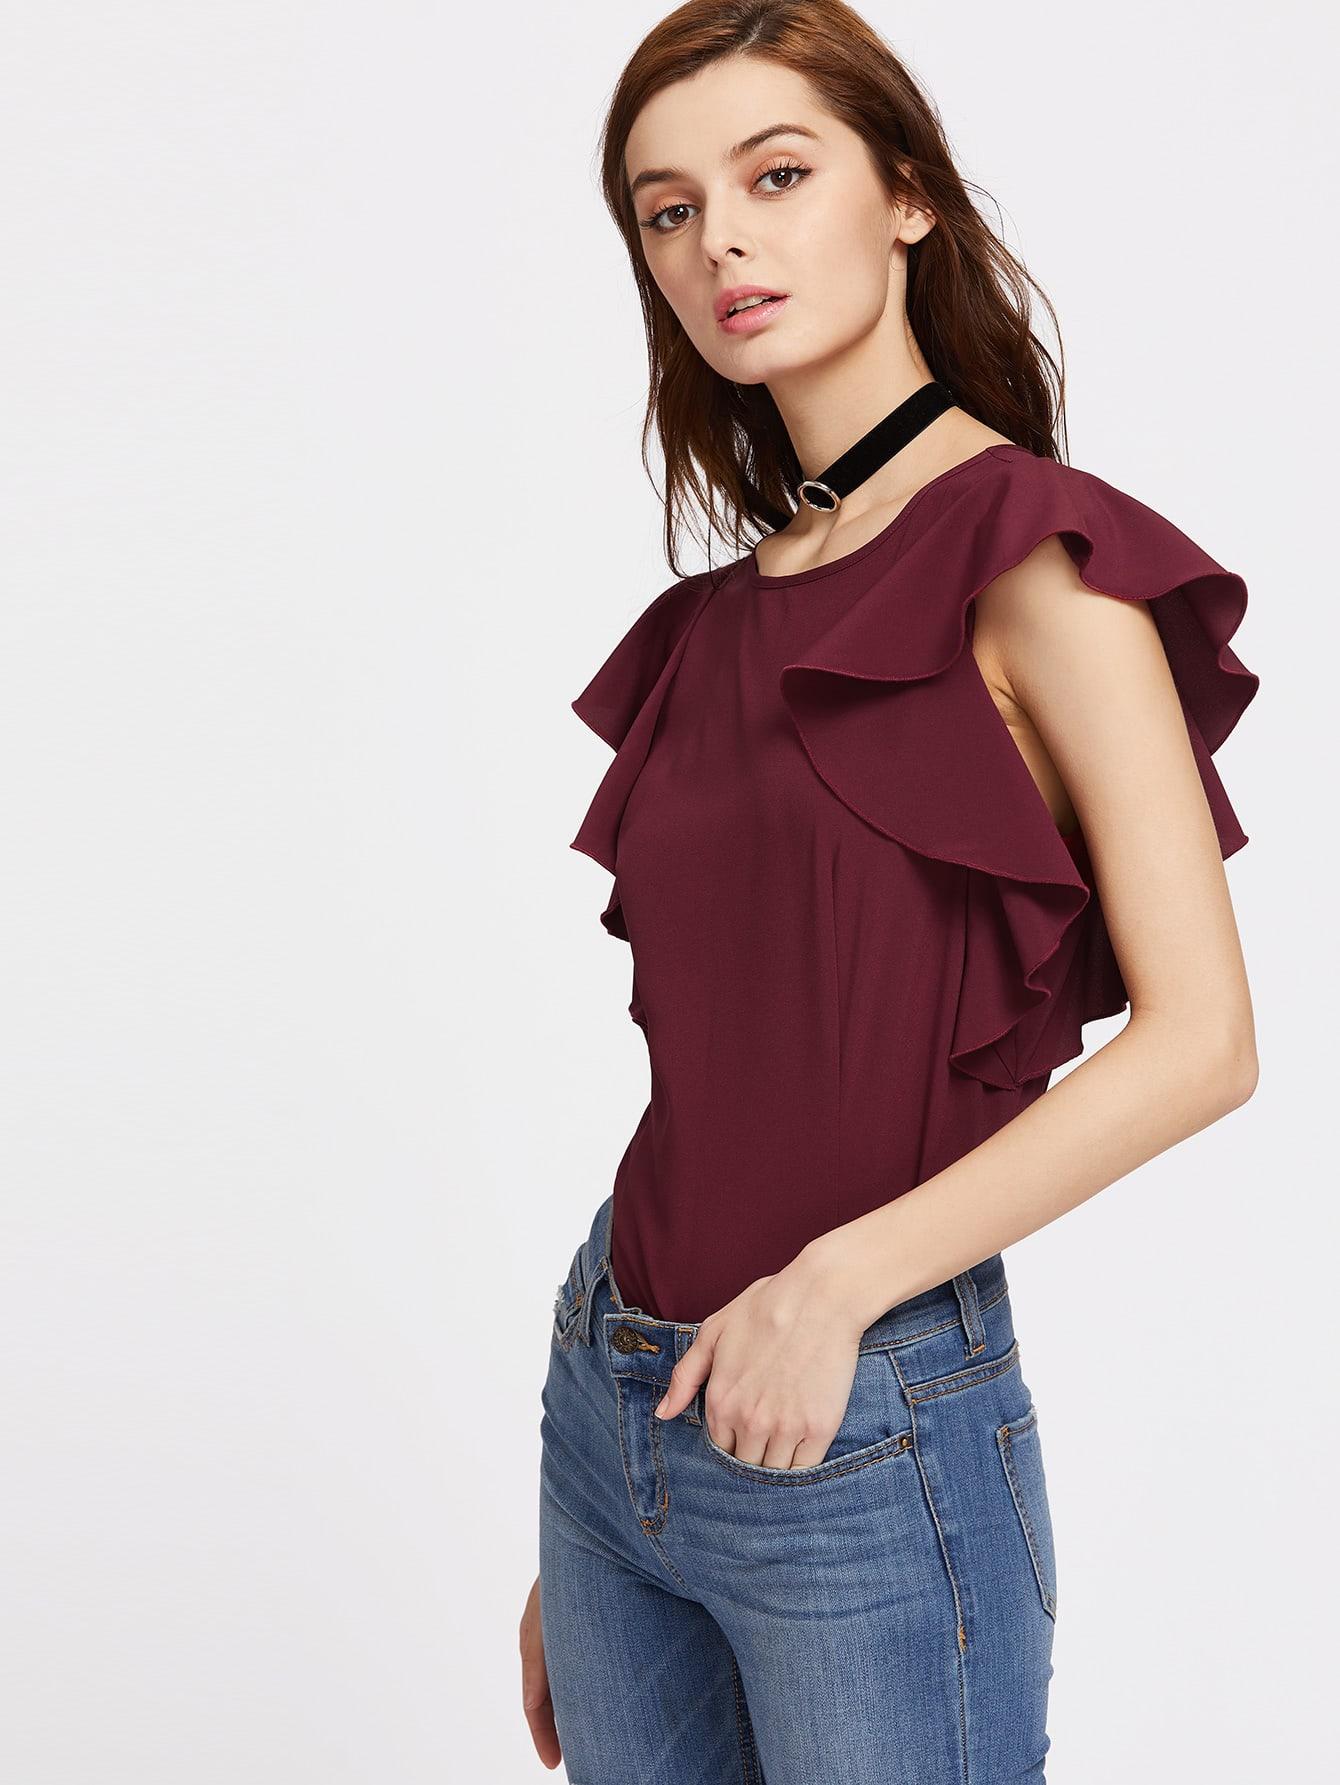 blouse170405707_2